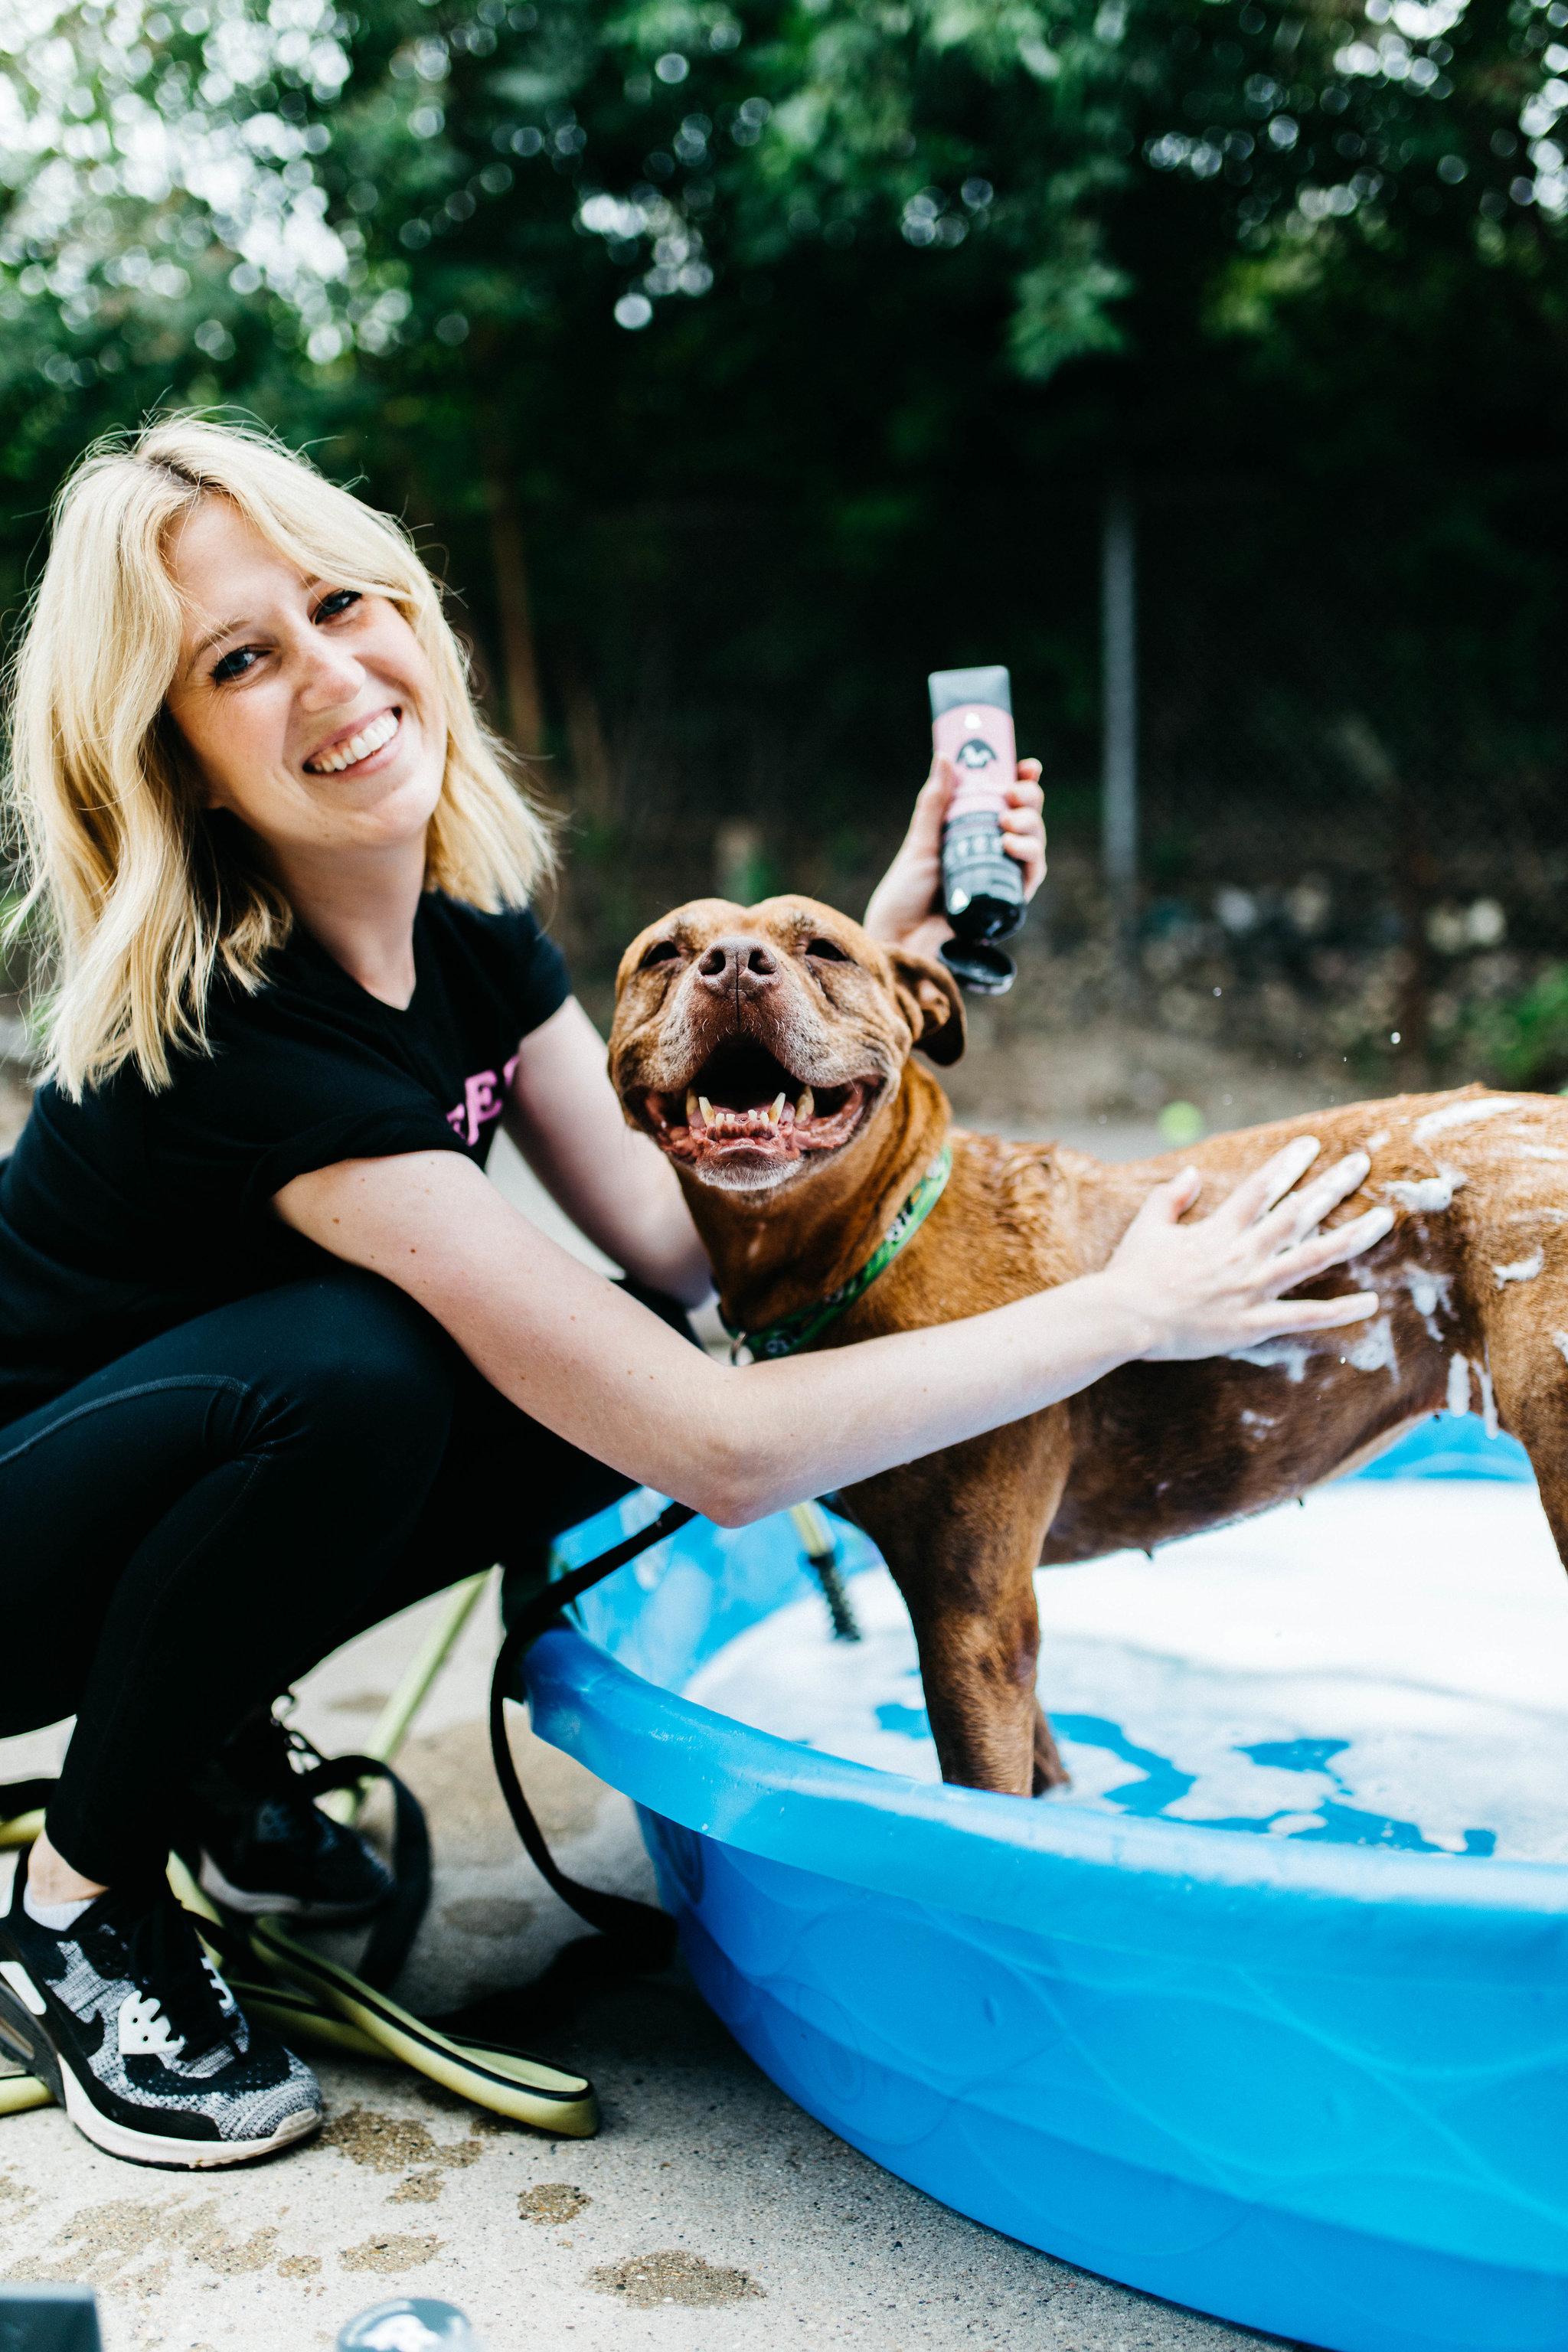 Why you shouldn't use human shampoo on your dog